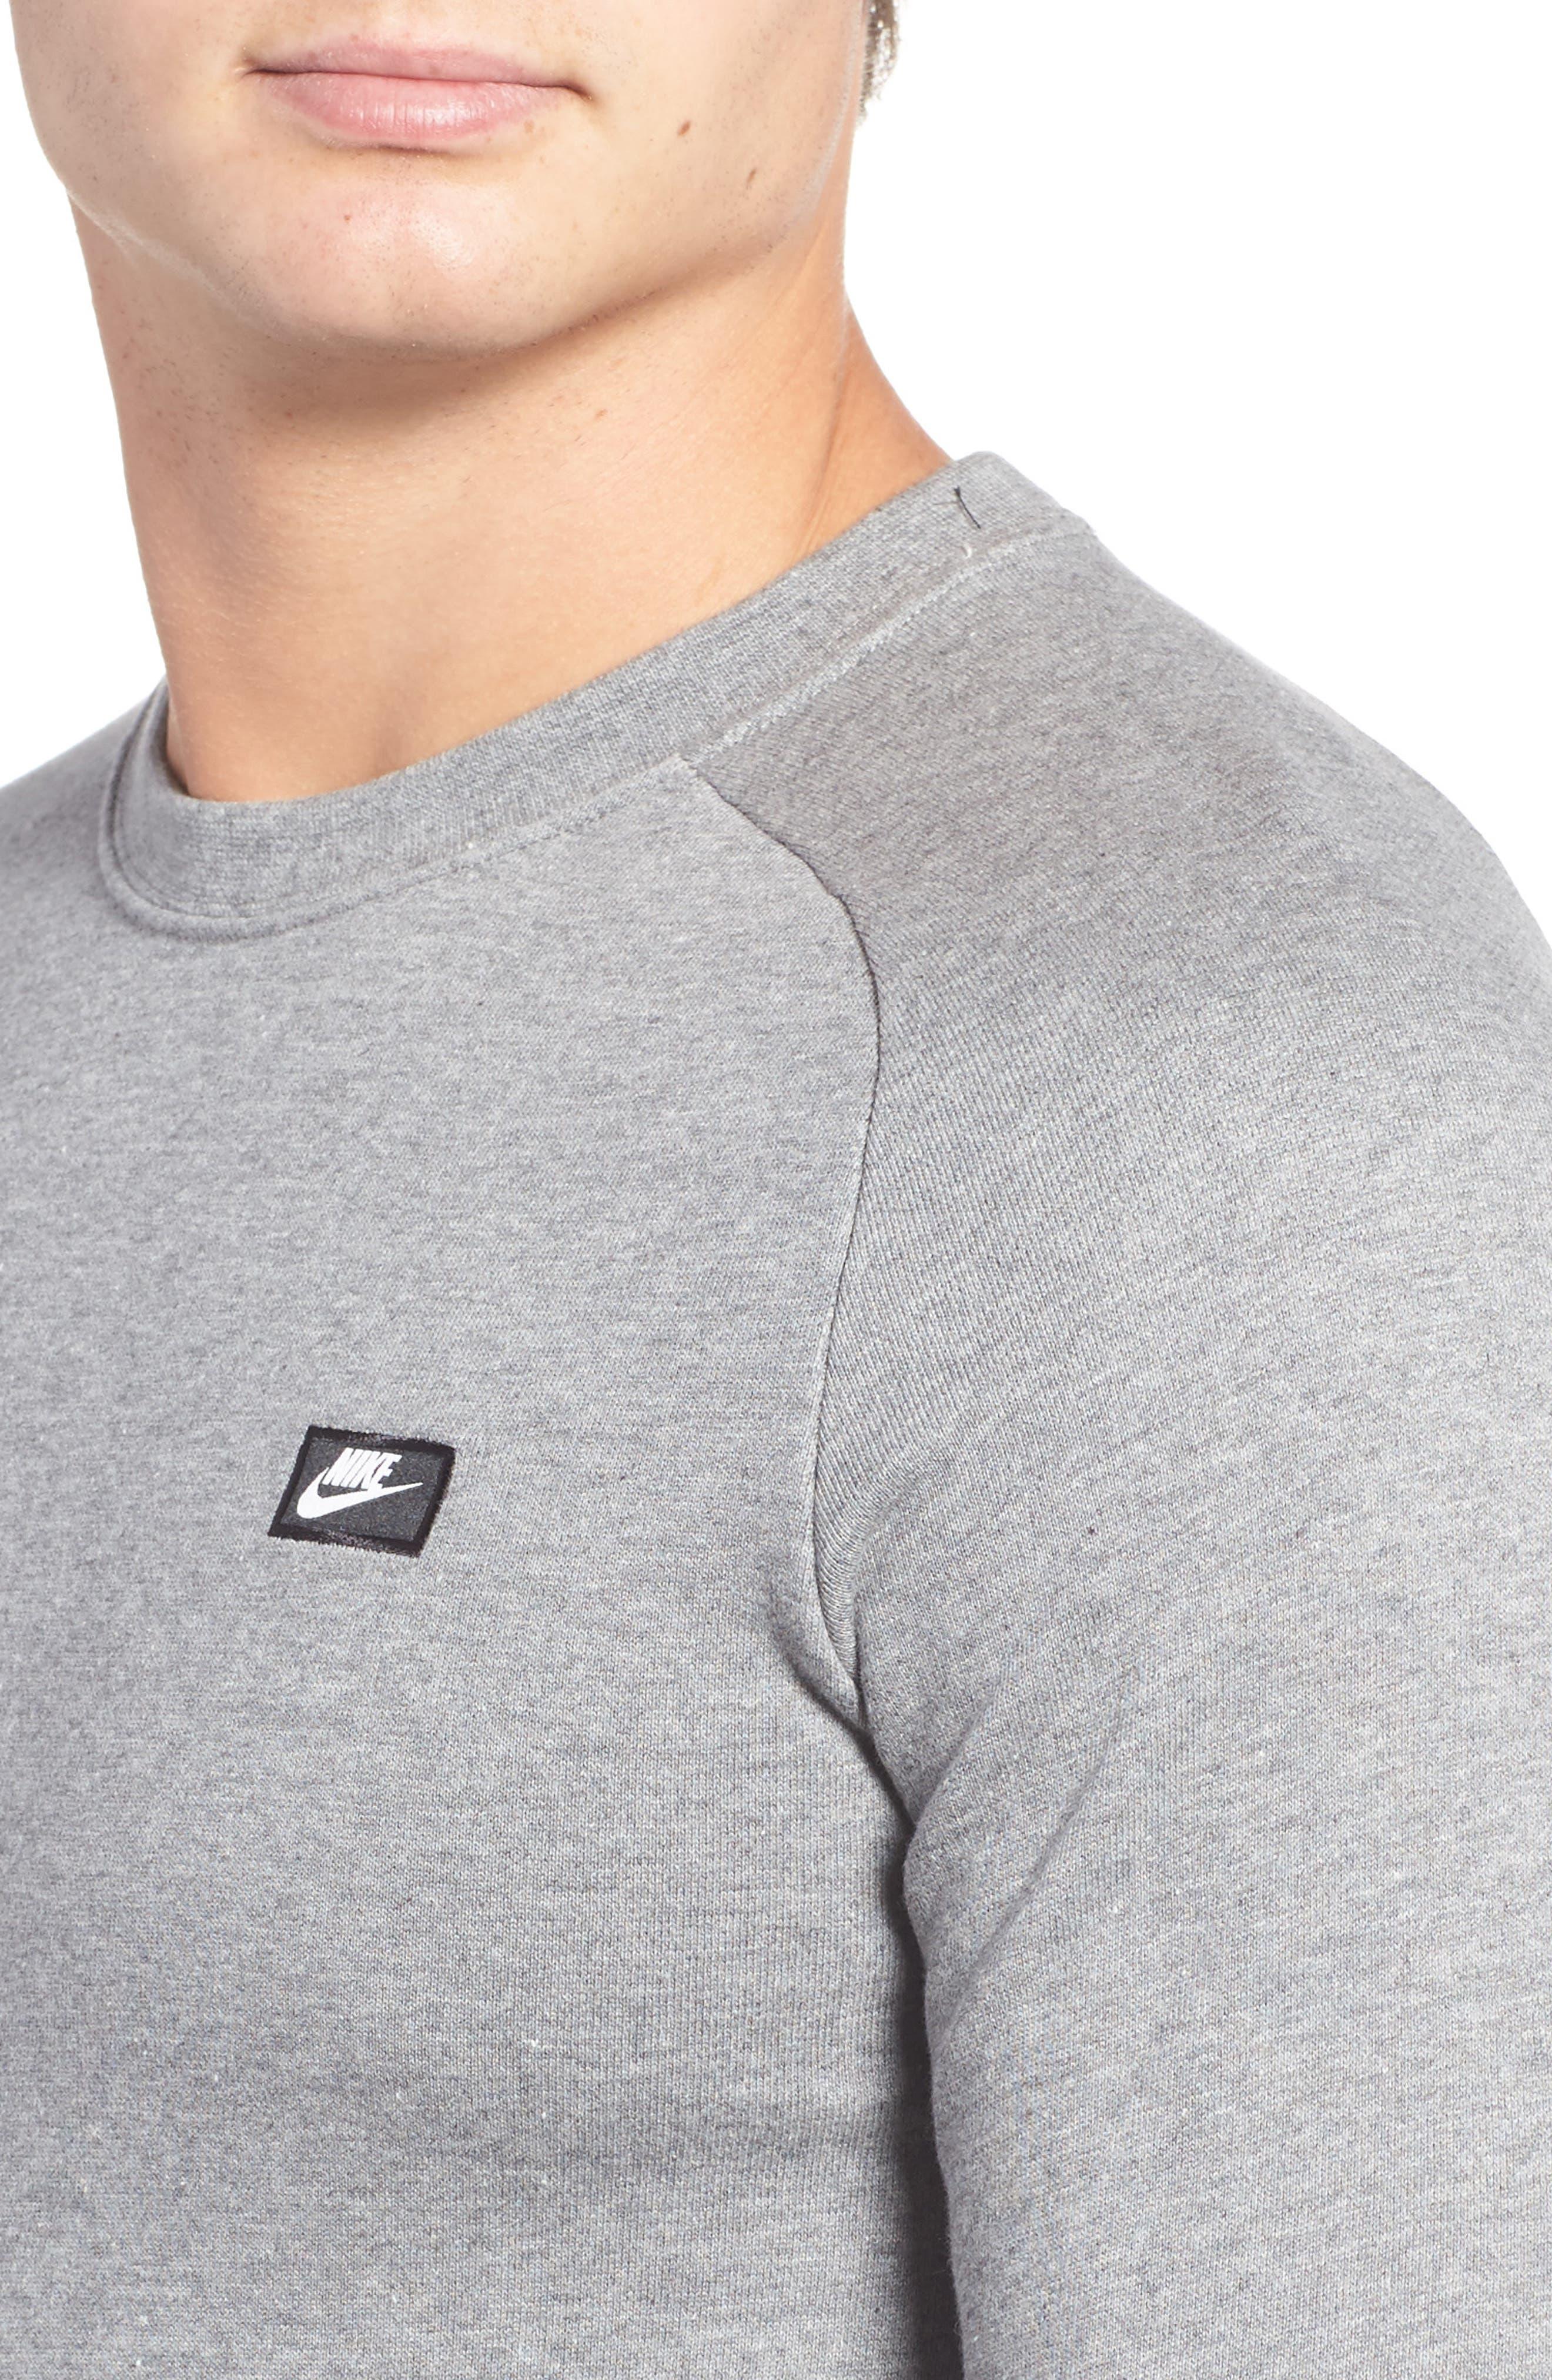 Sportswear Modern Crew T-Shirt,                             Alternate thumbnail 4, color,                             Grey